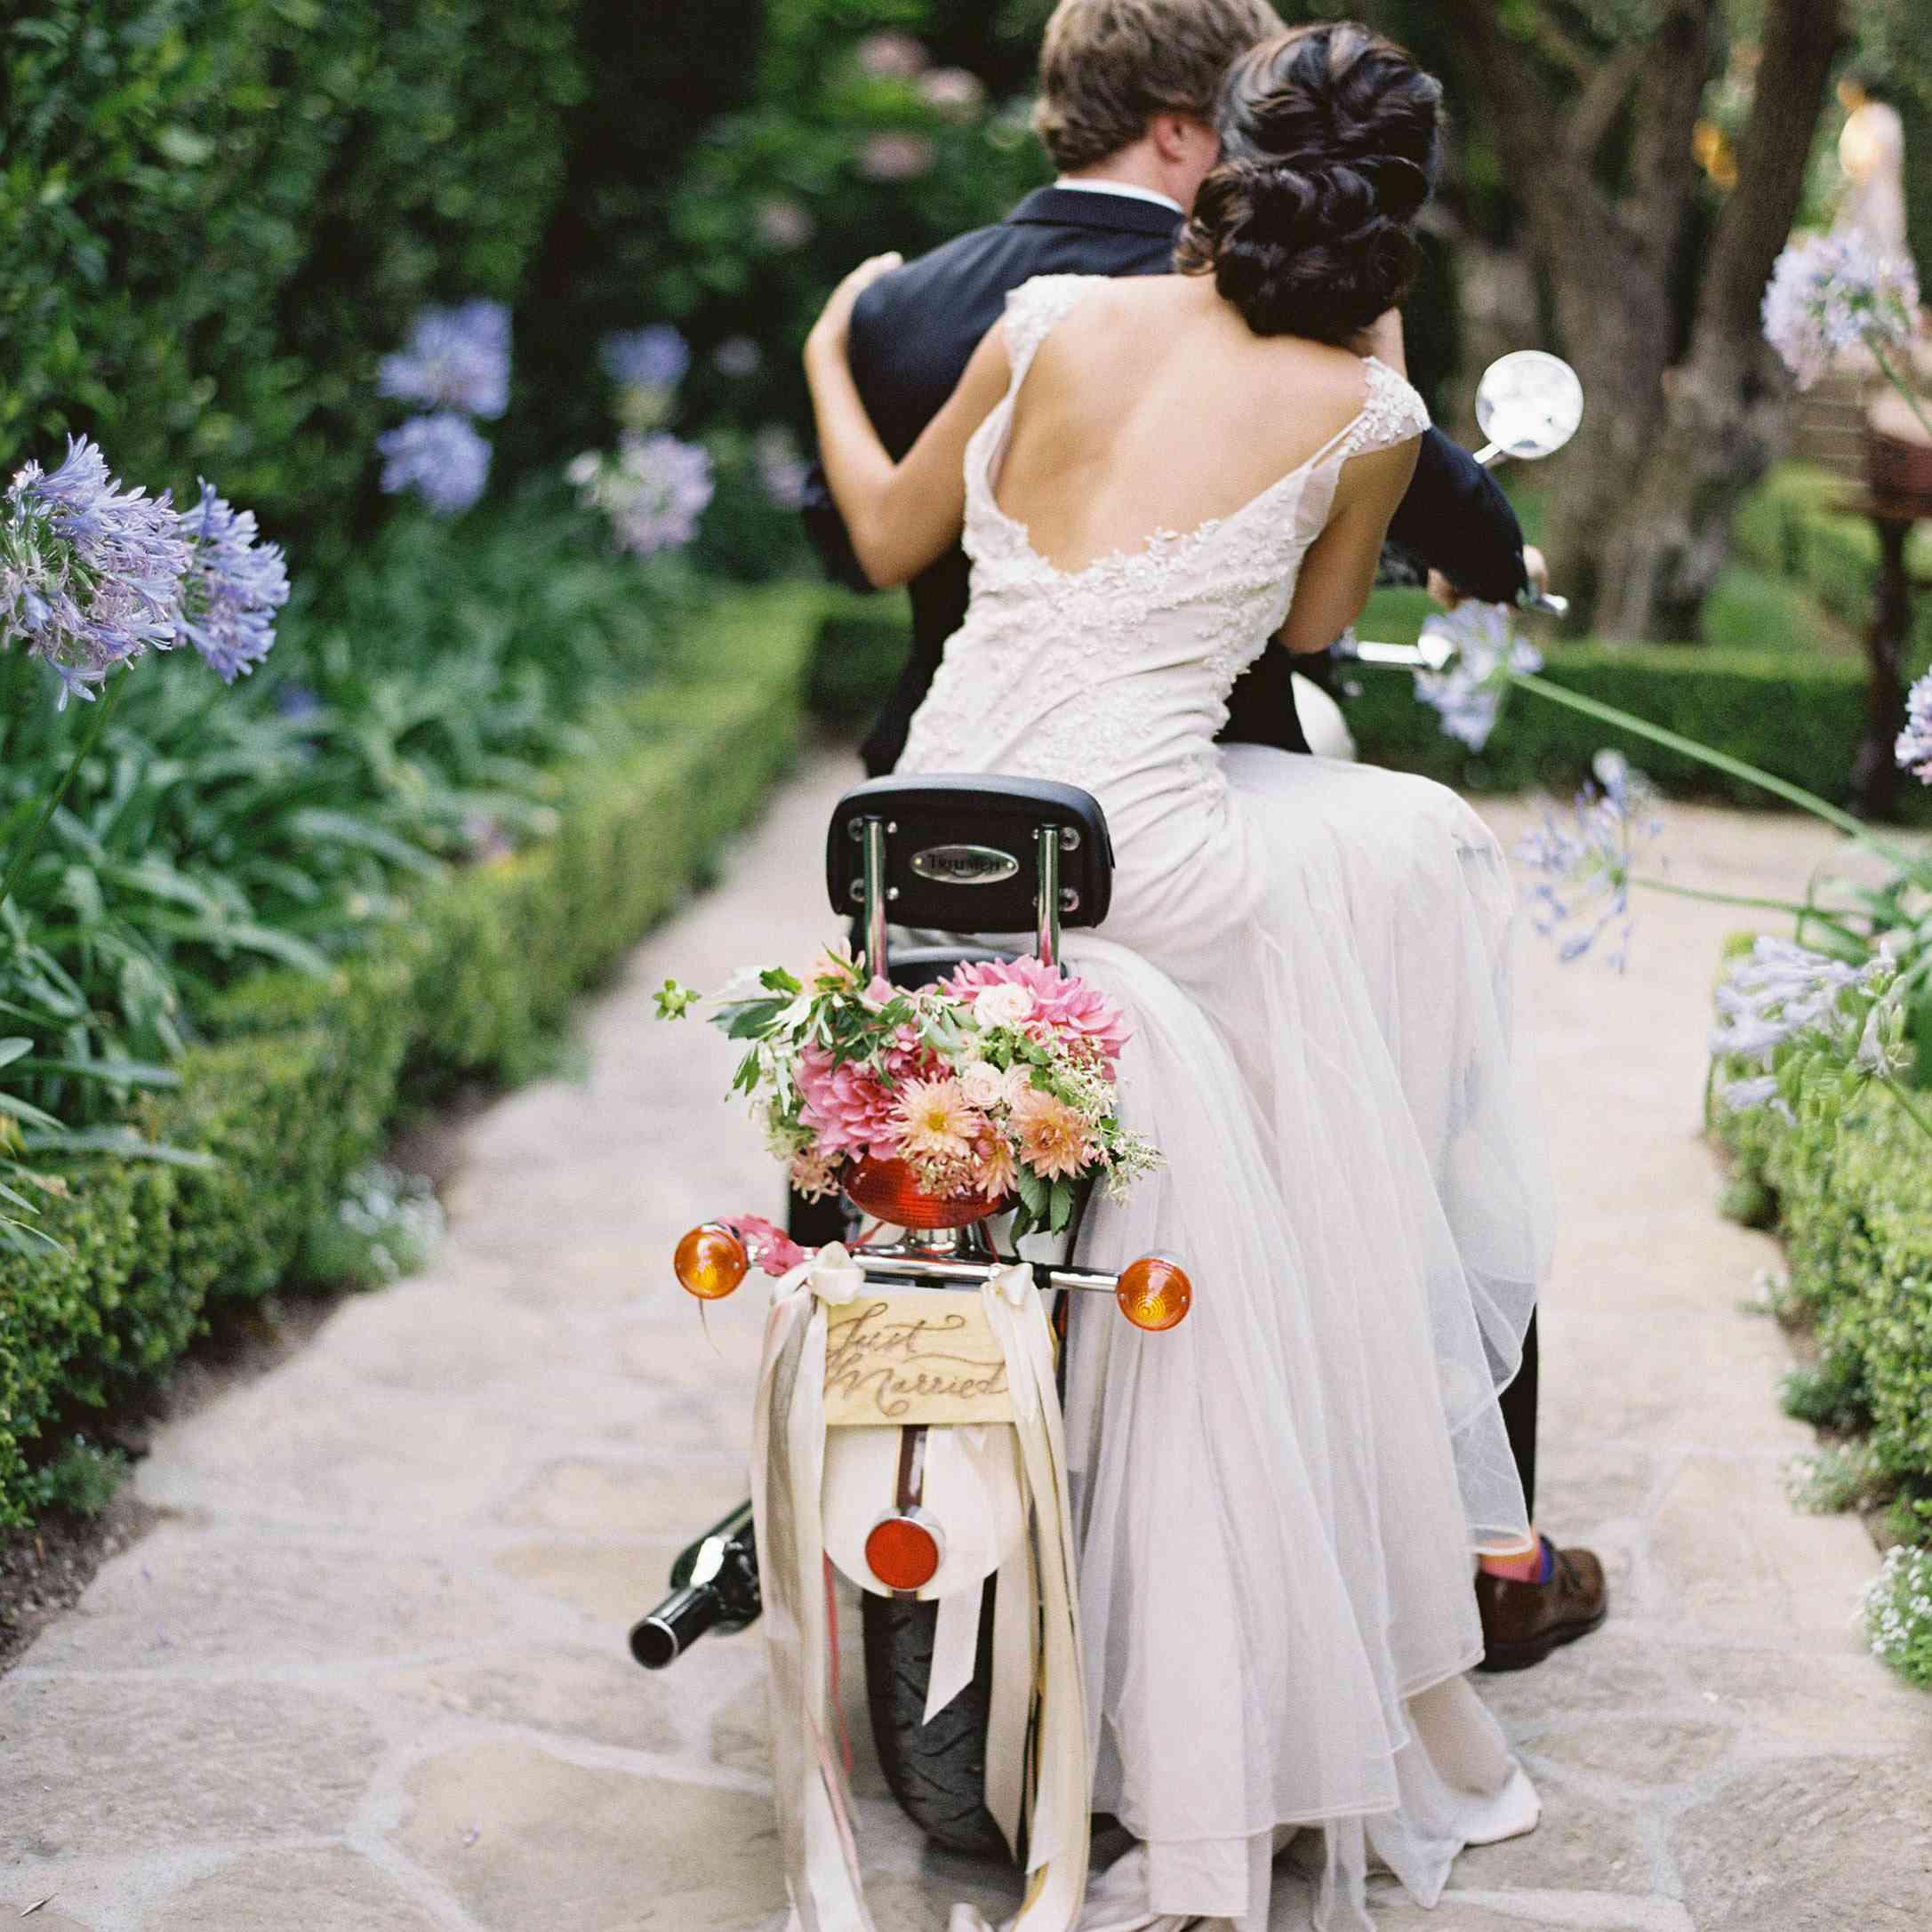 Newlyweds on motorcycle